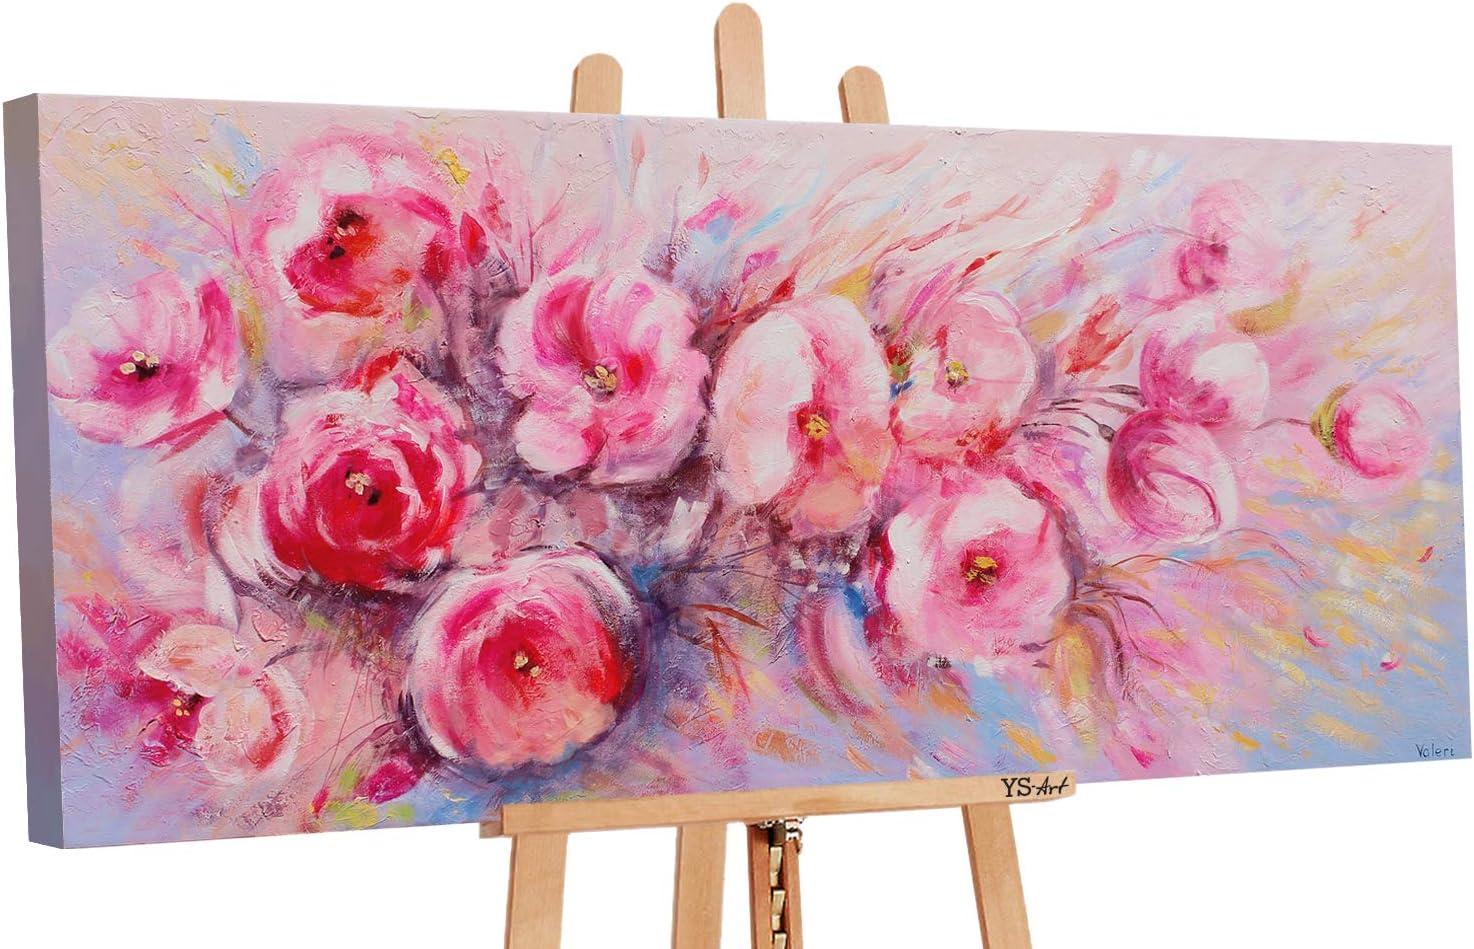 YS-Art | Cuadro Pintado a Mano Flores de Verano | Cuadro Moderno acrilico| 115x50 cm | Lienzo Pintado a Mano | Cuadros Dormitories | único | Rosado